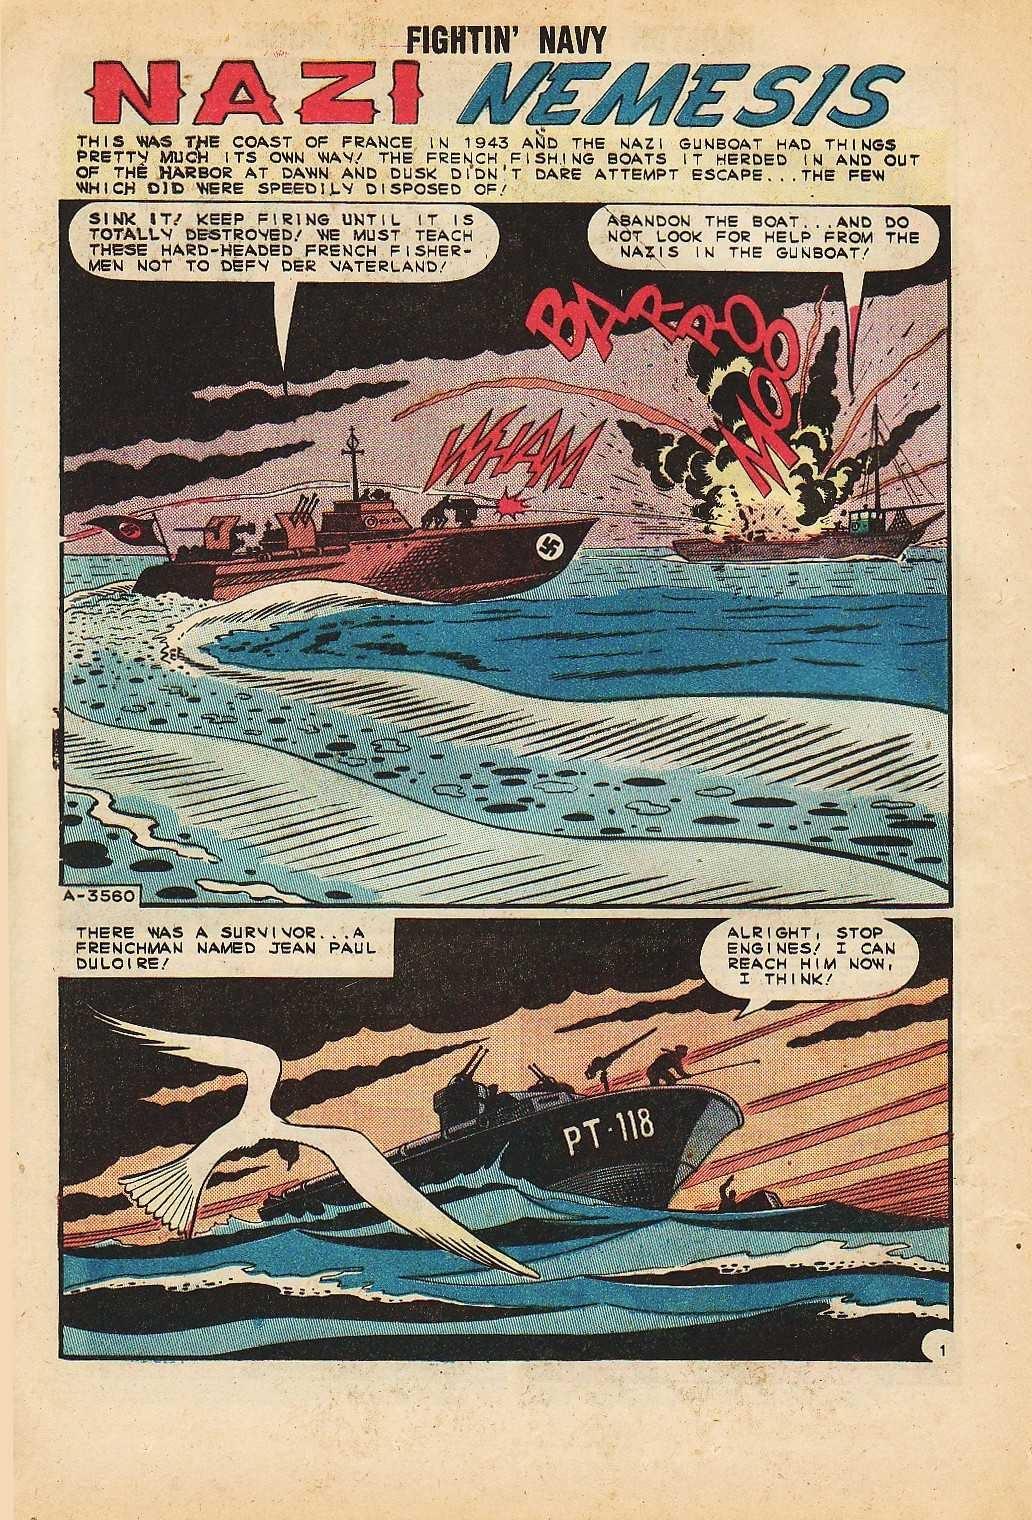 Read online Fightin' Navy comic -  Issue #116 - 12